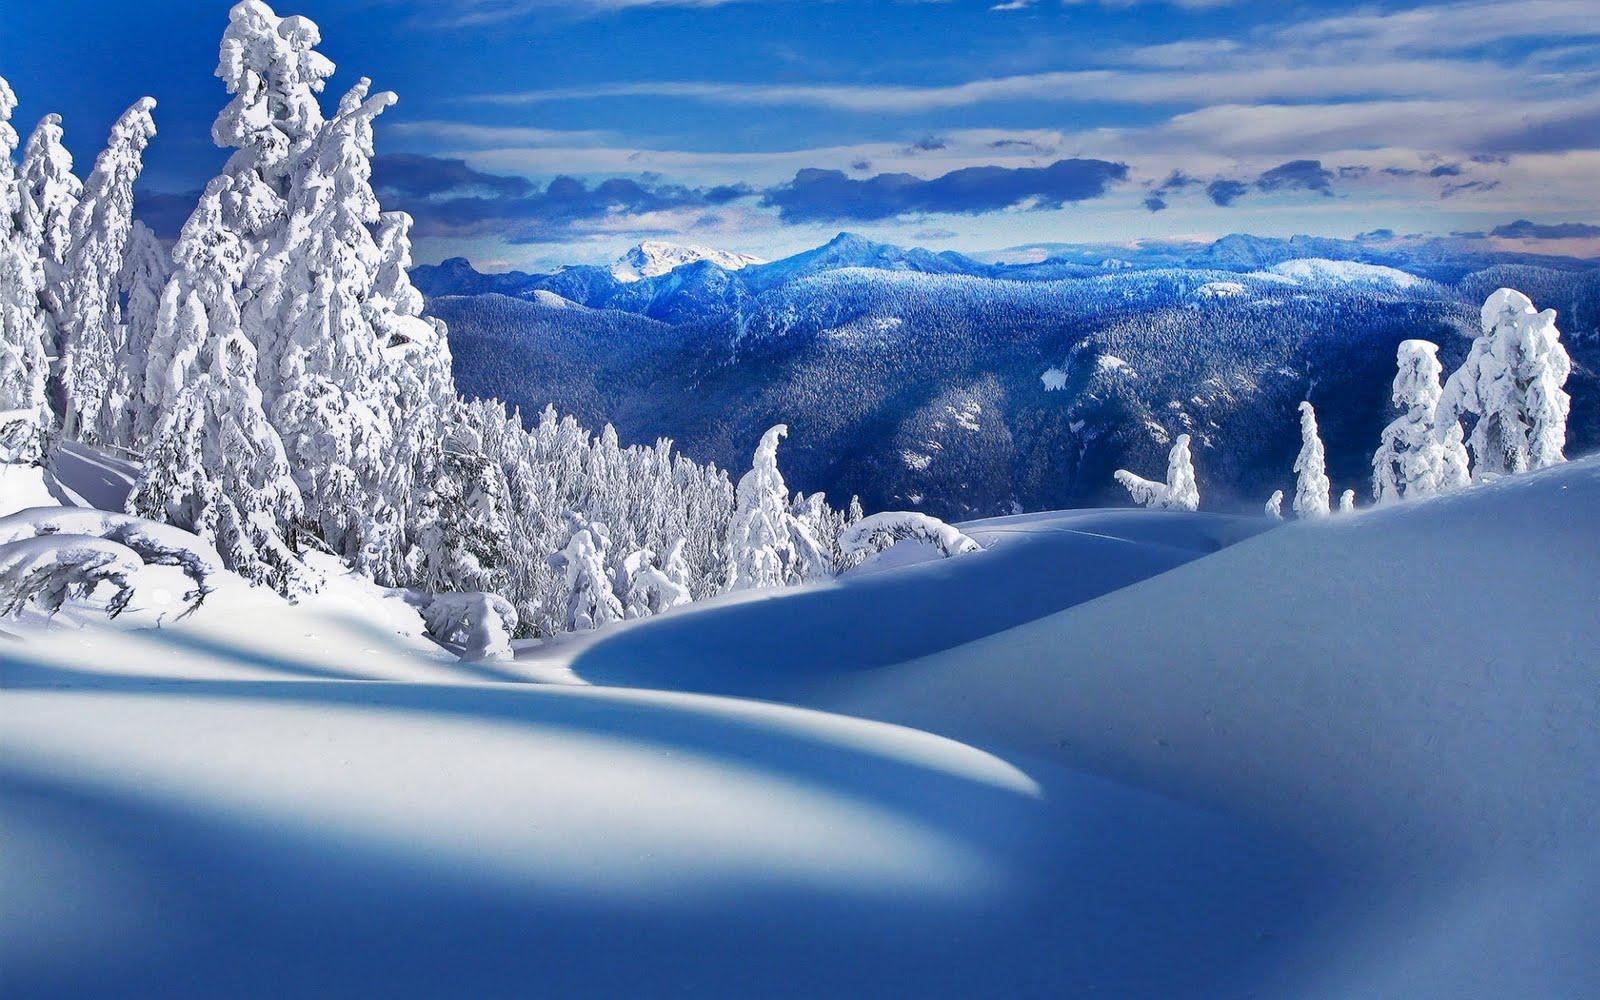 http://1.bp.blogspot.com/-oogAWsjVx4o/TkAz6Wj0-mI/AAAAAAAADHM/Y24U30E42VQ/s1600/ice-mountains-canada-free_wallpapers.jpg